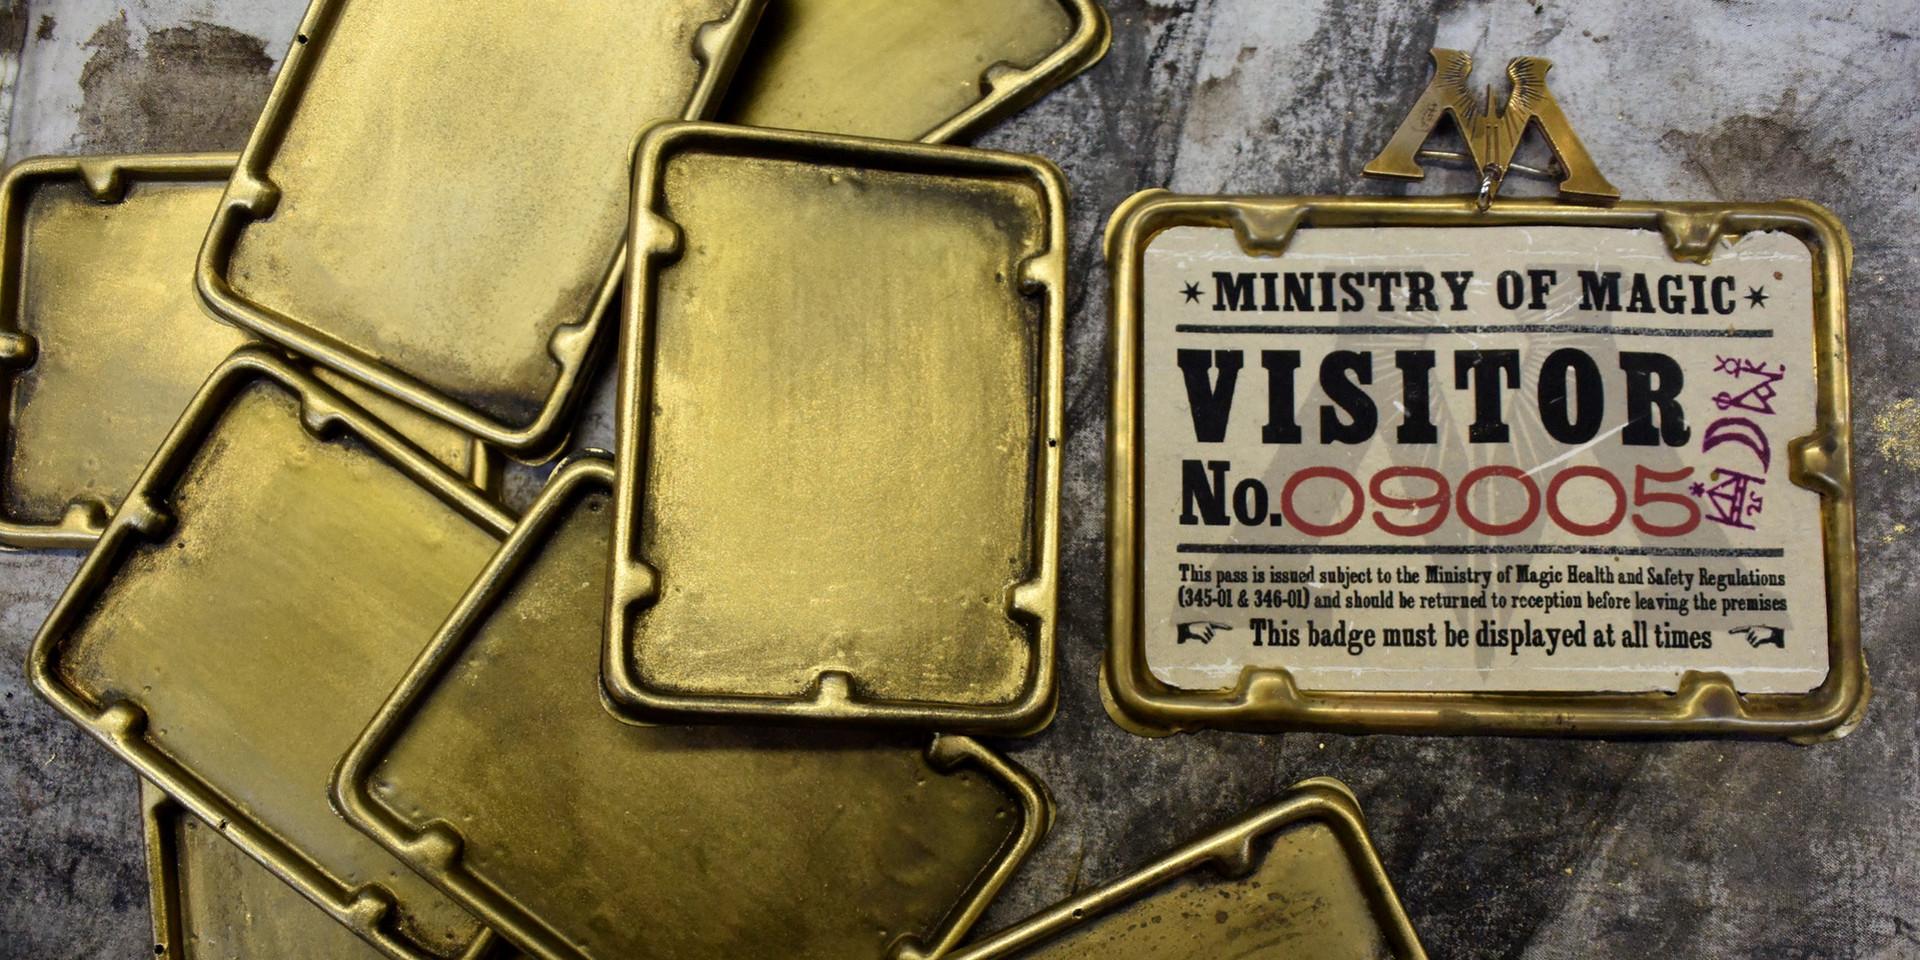 Fantastic Beasts 2. ID cards